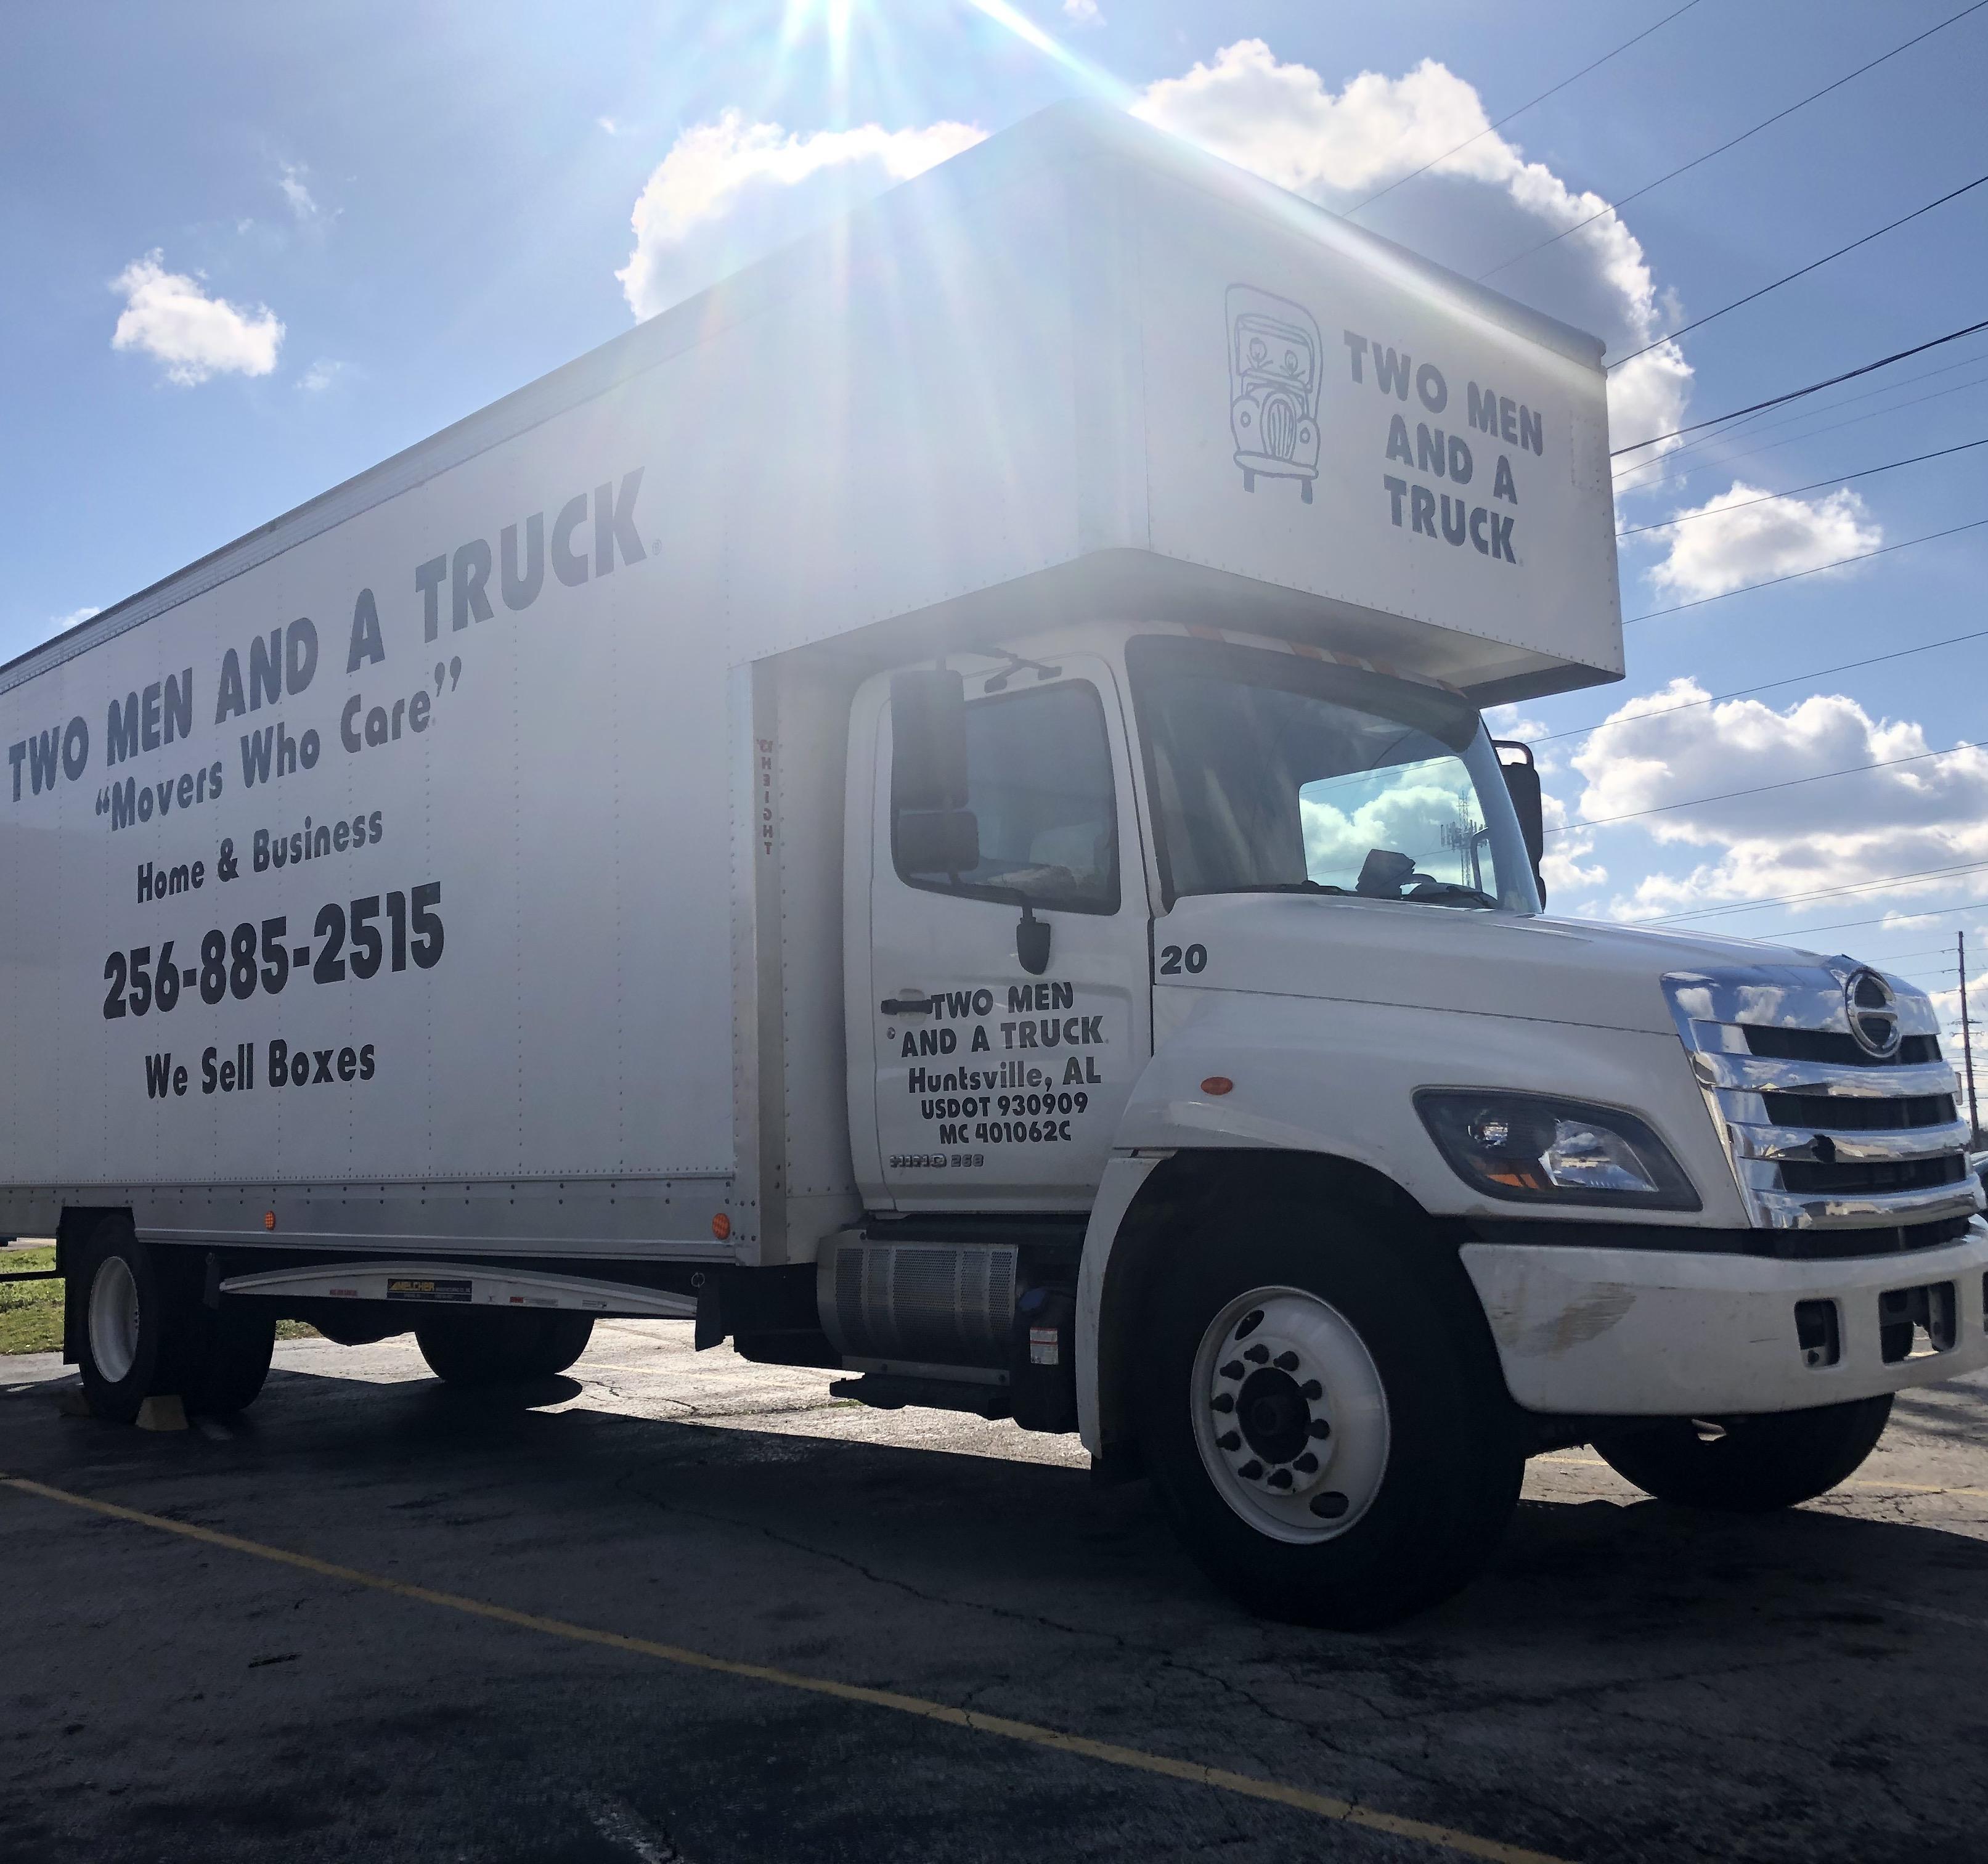 Two Men And A Truck Huntsville Truck